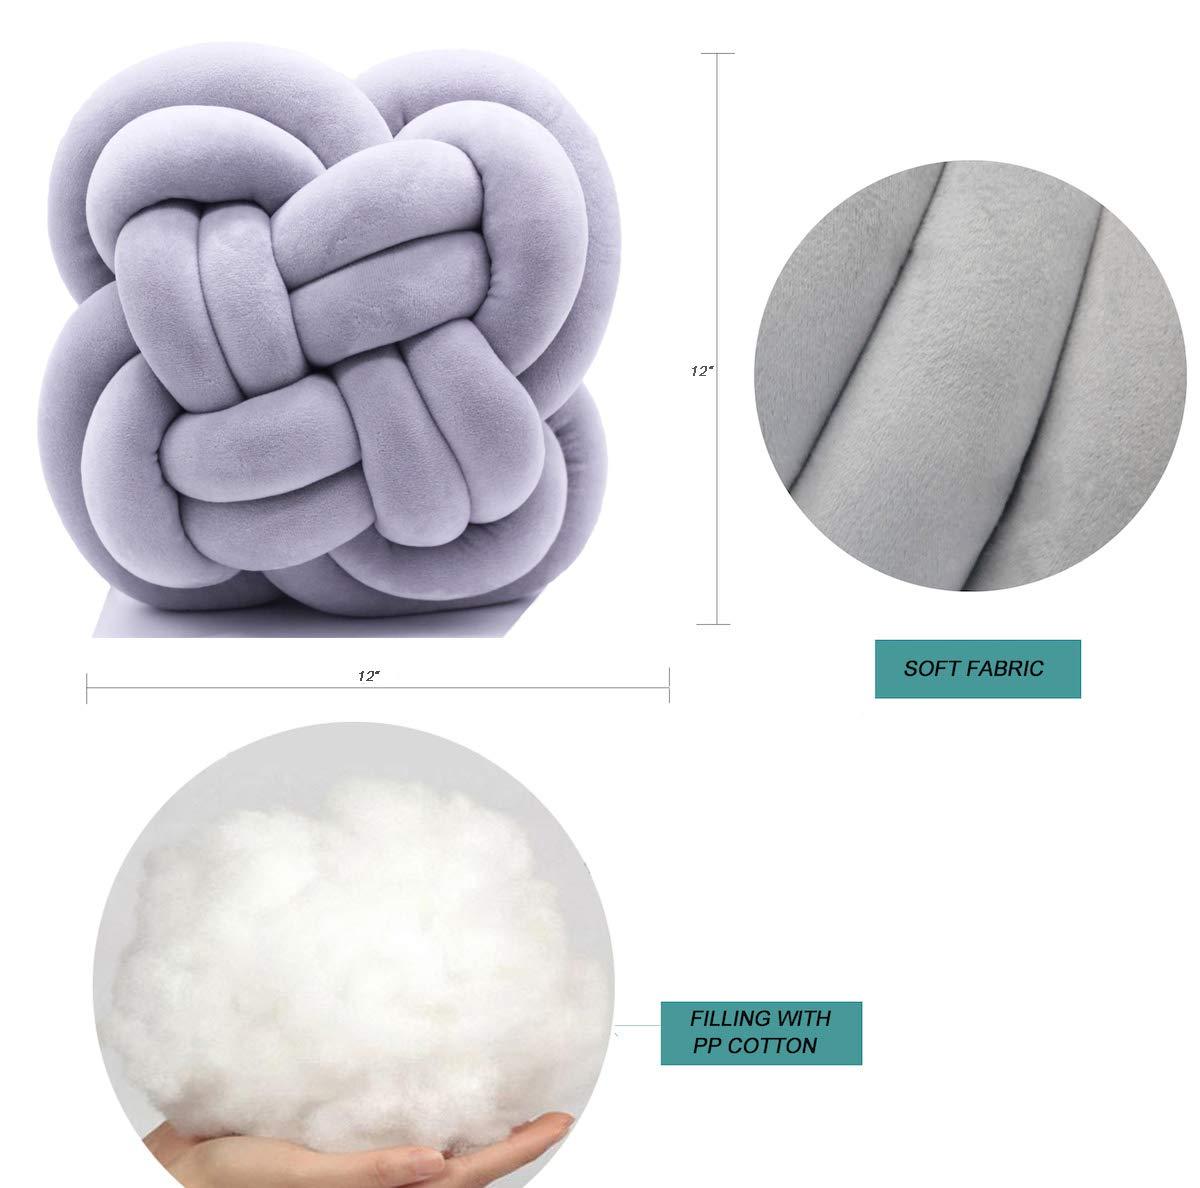 FLORAVOGUE Large Knot Pillow Decorative Cushion – Modern Home Sofa Decor Pillows Pillow Light Gray